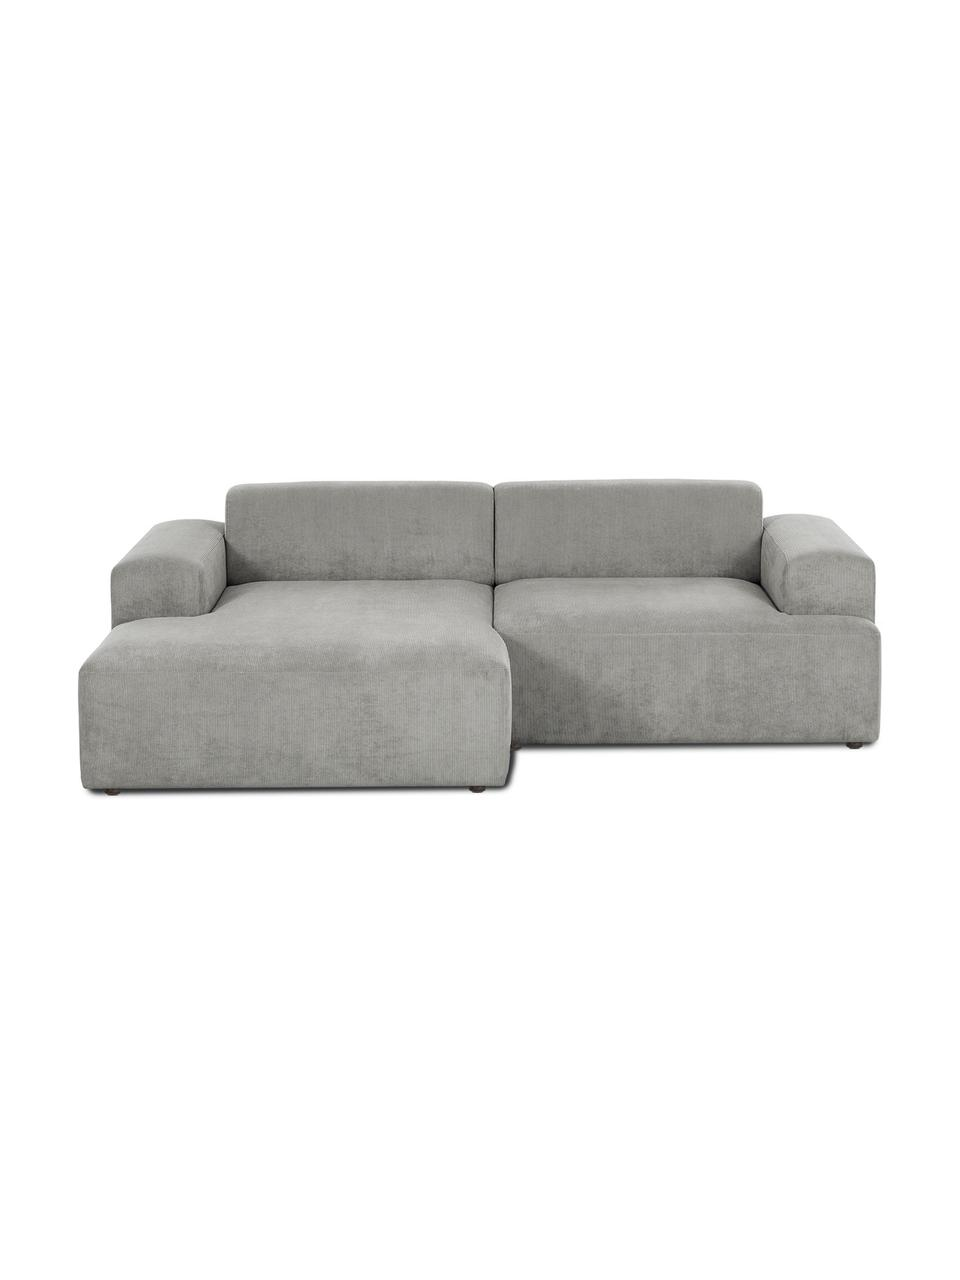 Cord-Ecksofa Melva (3-Sitzer) in Grau, Bezug: Cord (92% Polyester, 8% P, Gestell: Massives Kiefernholz, FSC, Füße: Kunststoff, Cord Grau, B 239 x T 143 cm